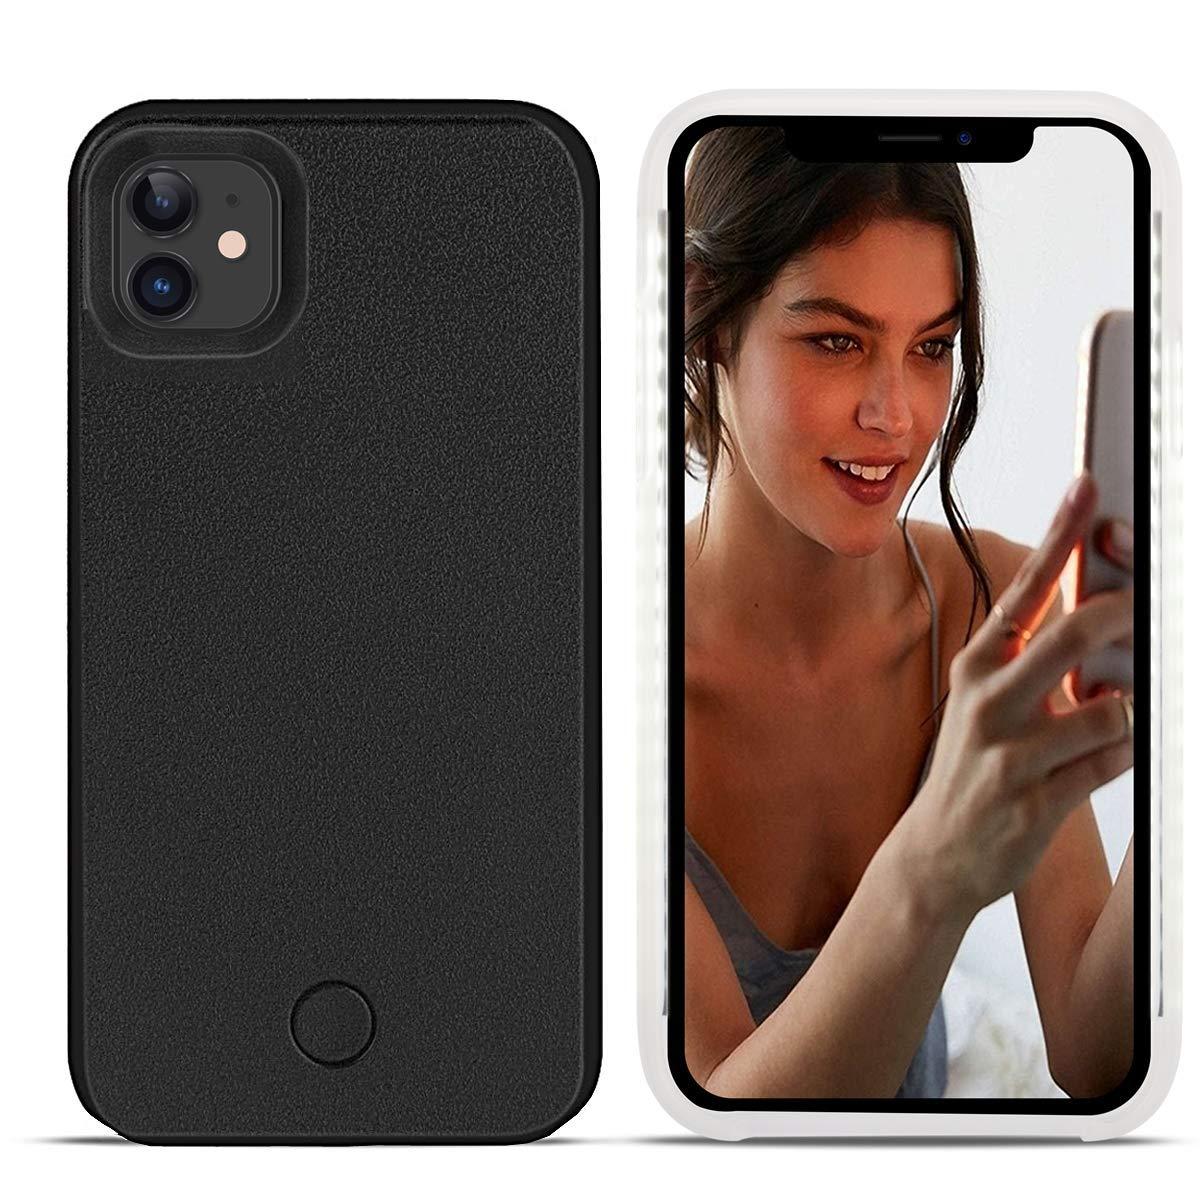 Avkkey iPhone 11 Pro MAX LED Caso iPhone 11 Pro MAX Selfie luz iPhone Caso Ideal para un Brillante Selfie y FaceTime Iluminado luz Up Carcasa para iPhone 11 Pro MAX 6.5 Inch Oro Rosa